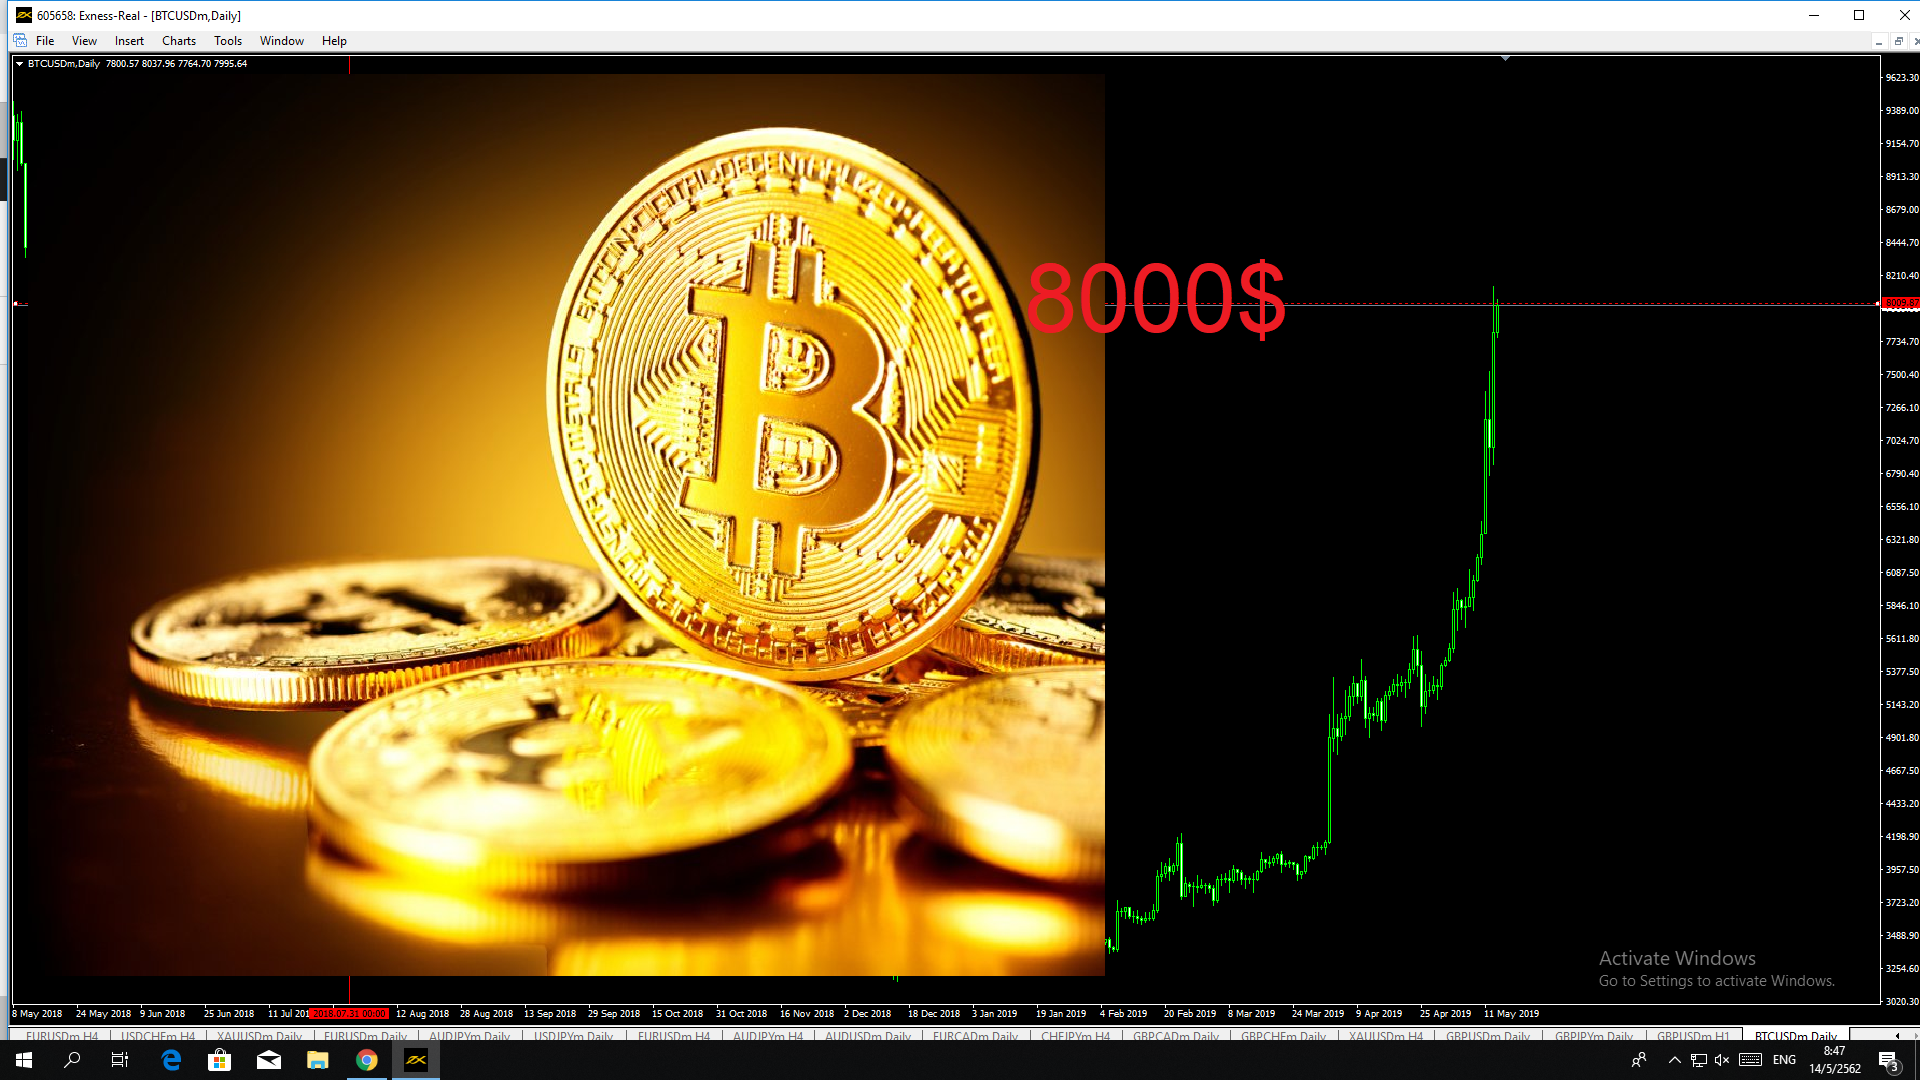 forex broker bitcoin mt4 stručni savjetnik za binarne opcije broker